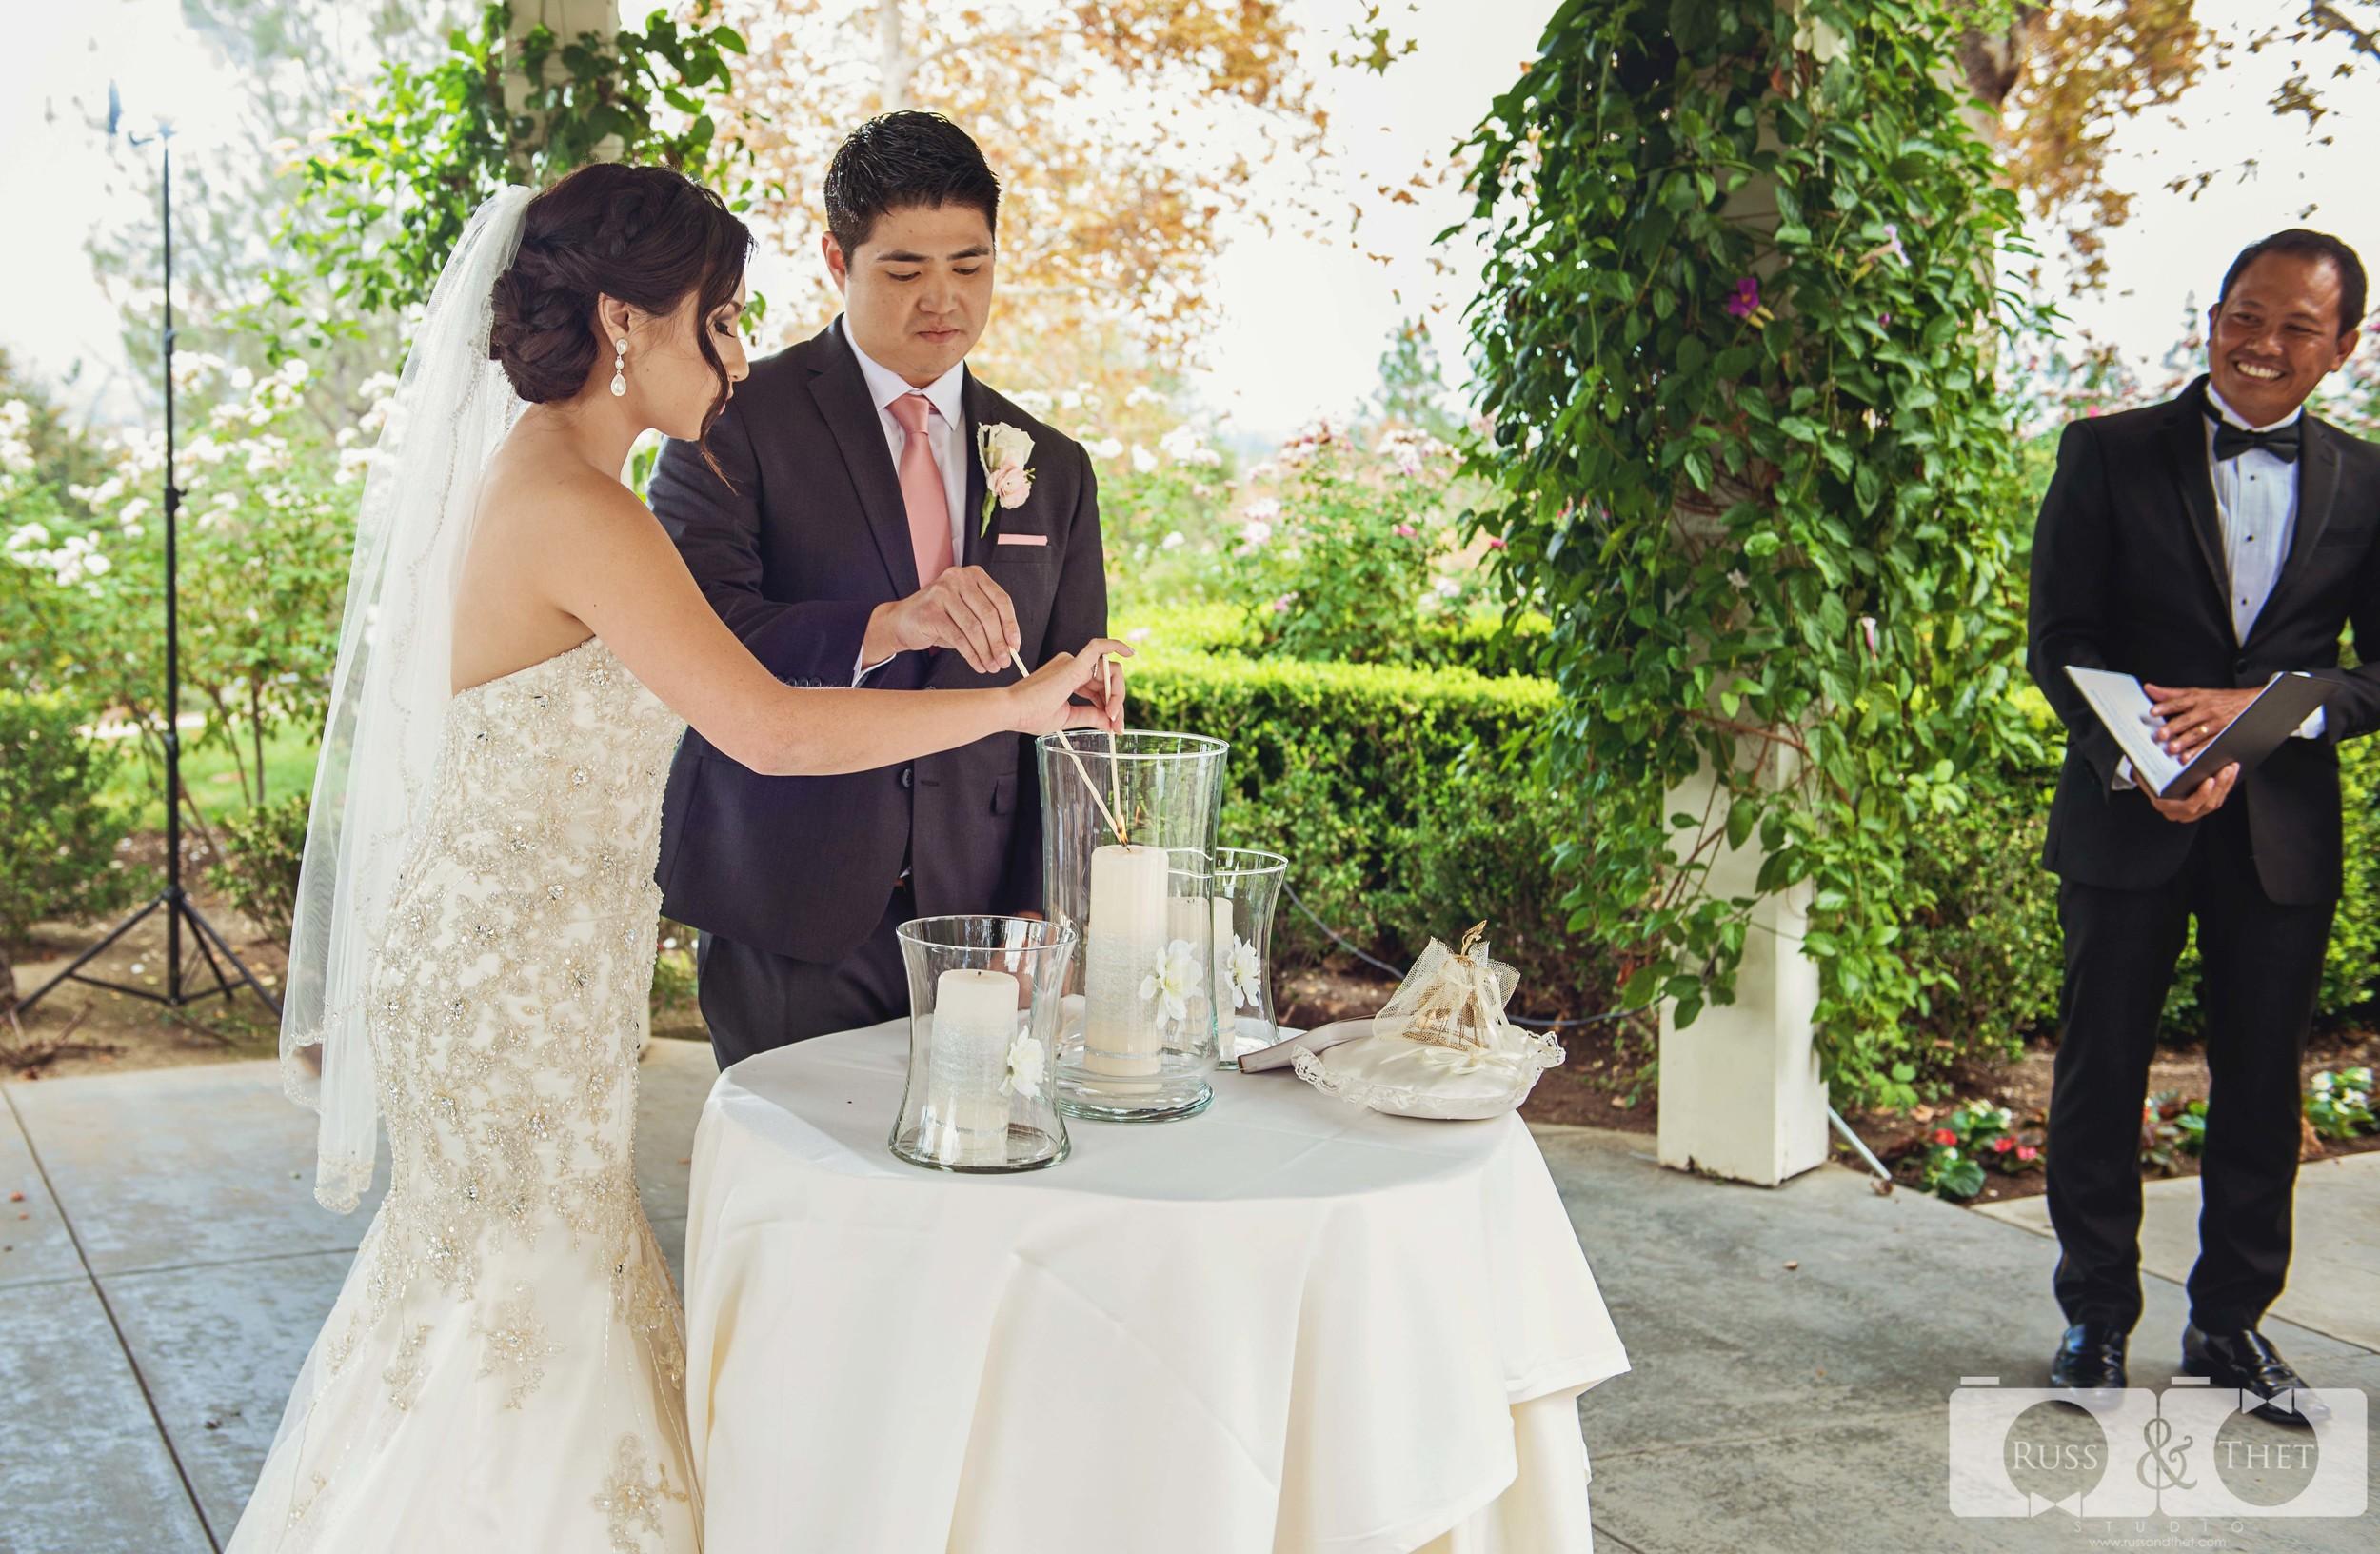 summit-house-fullerton-wedding-photographer-92.JPG